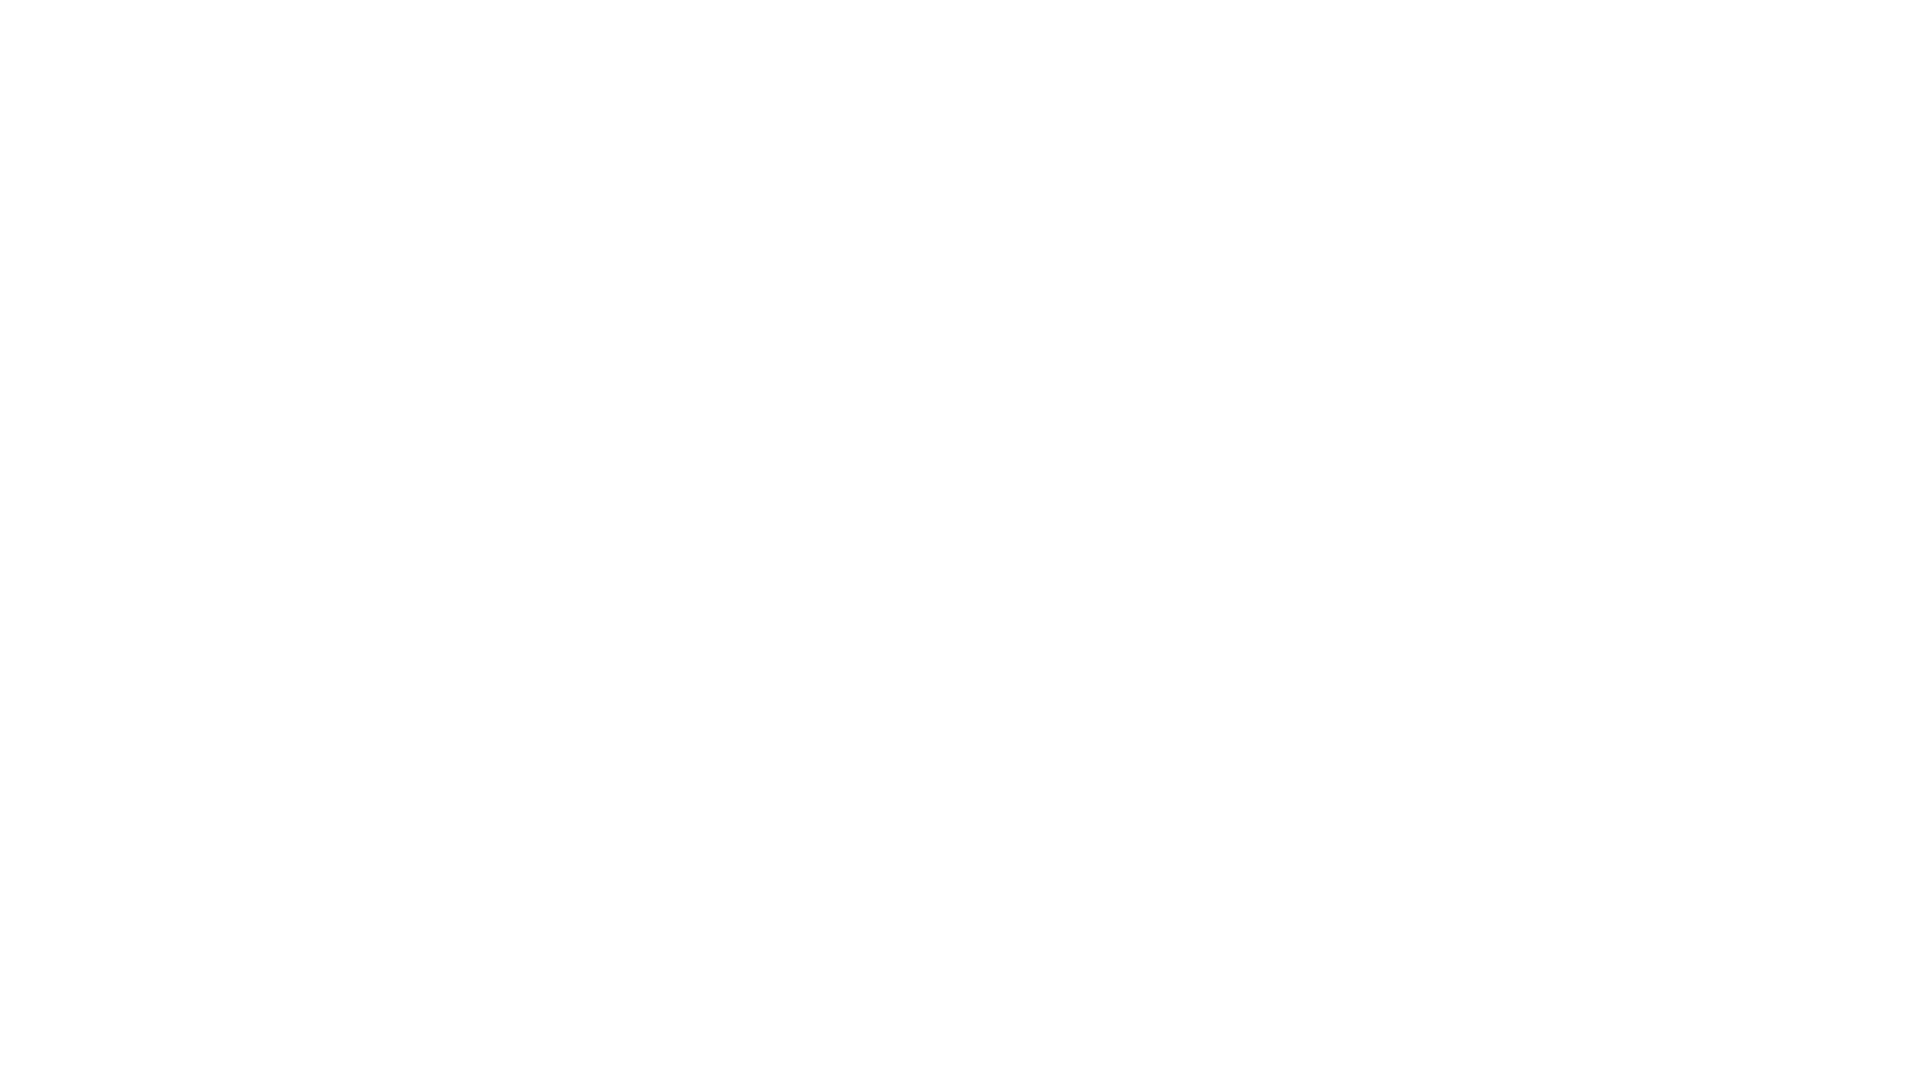 cgo-white-1